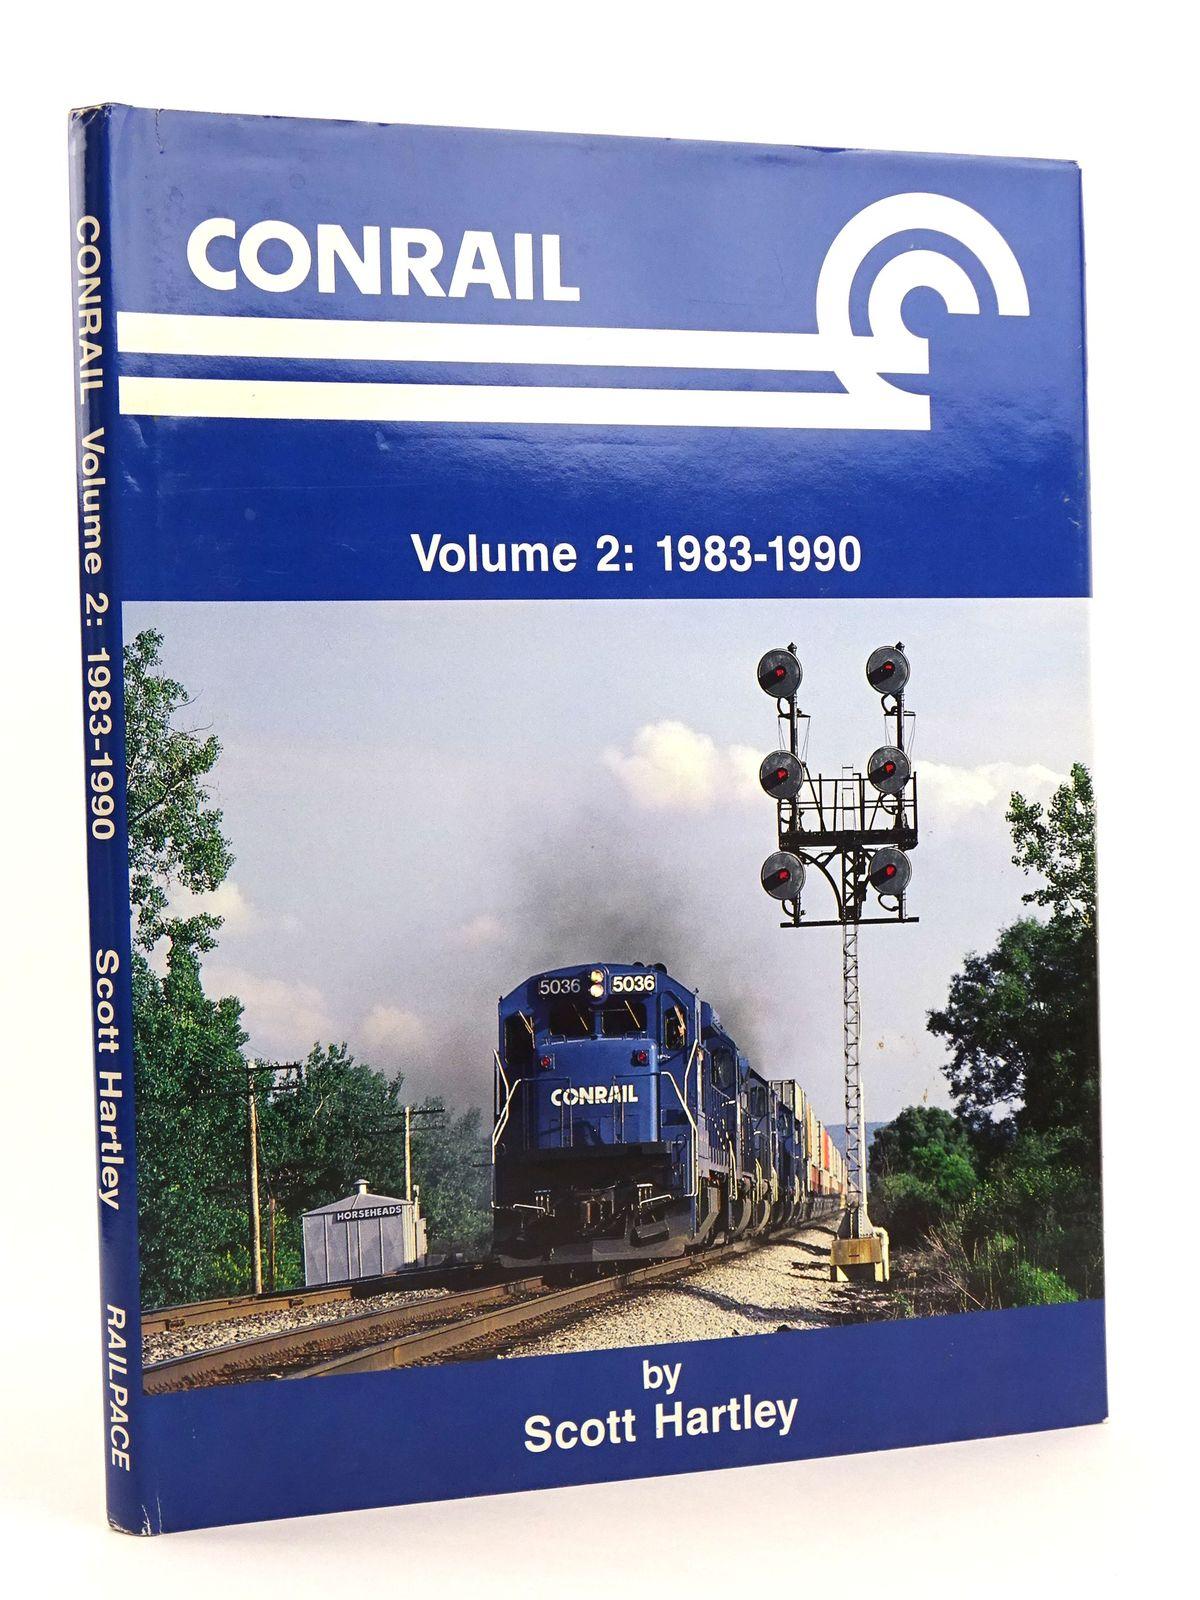 Photo of CONRAIL VOLUME 2: 1983-1990